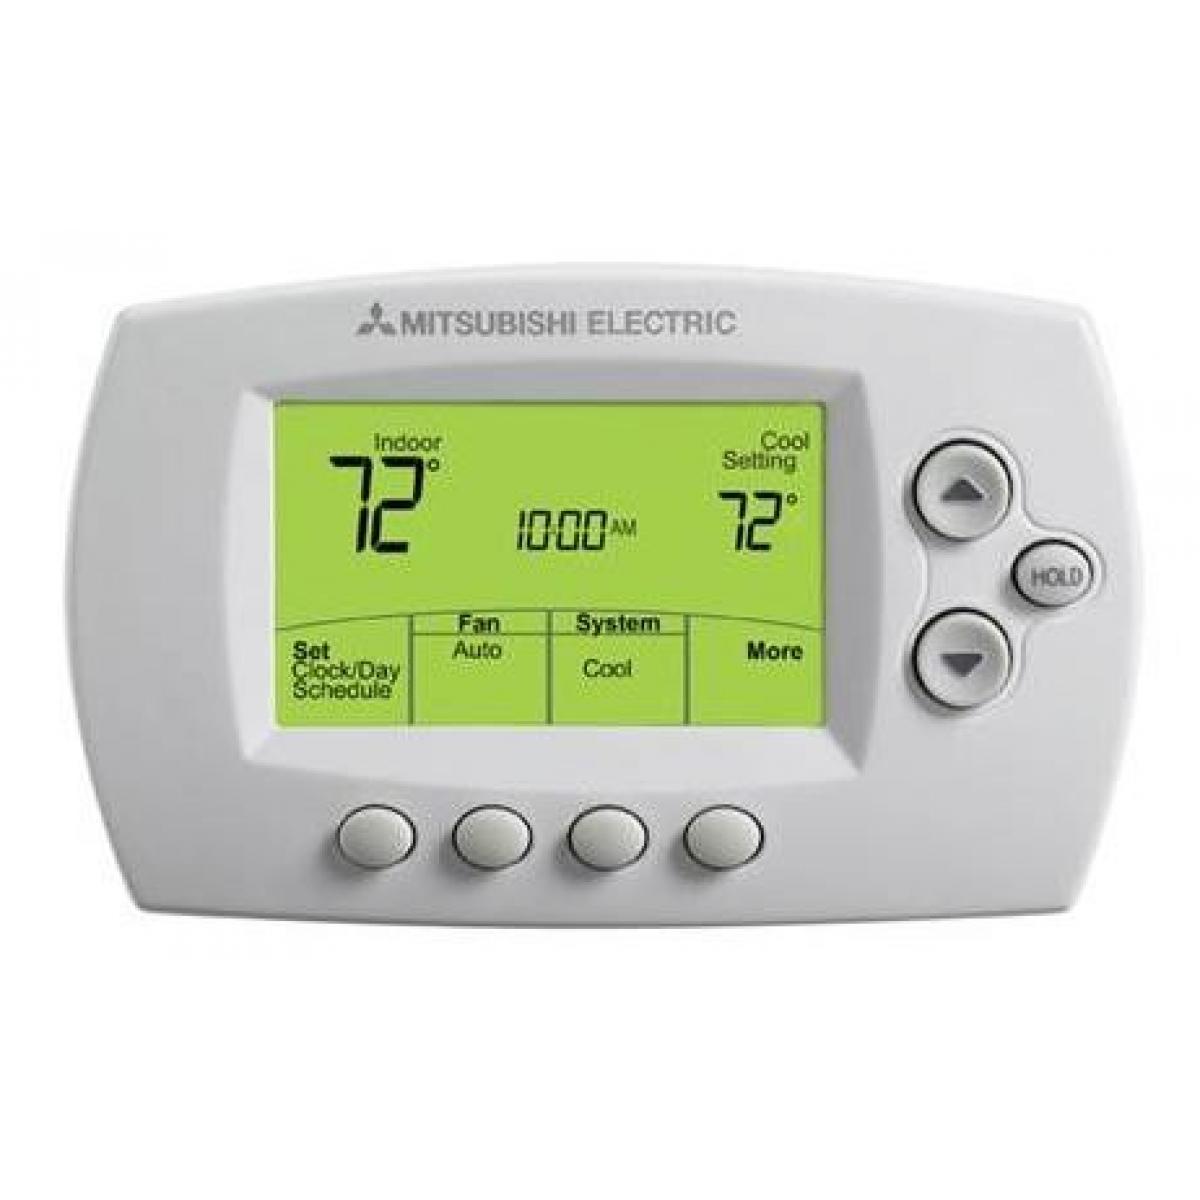 MXZ-2C20NA Split Air Conditioning and Heating 20K BTU - 2 Indoor Units